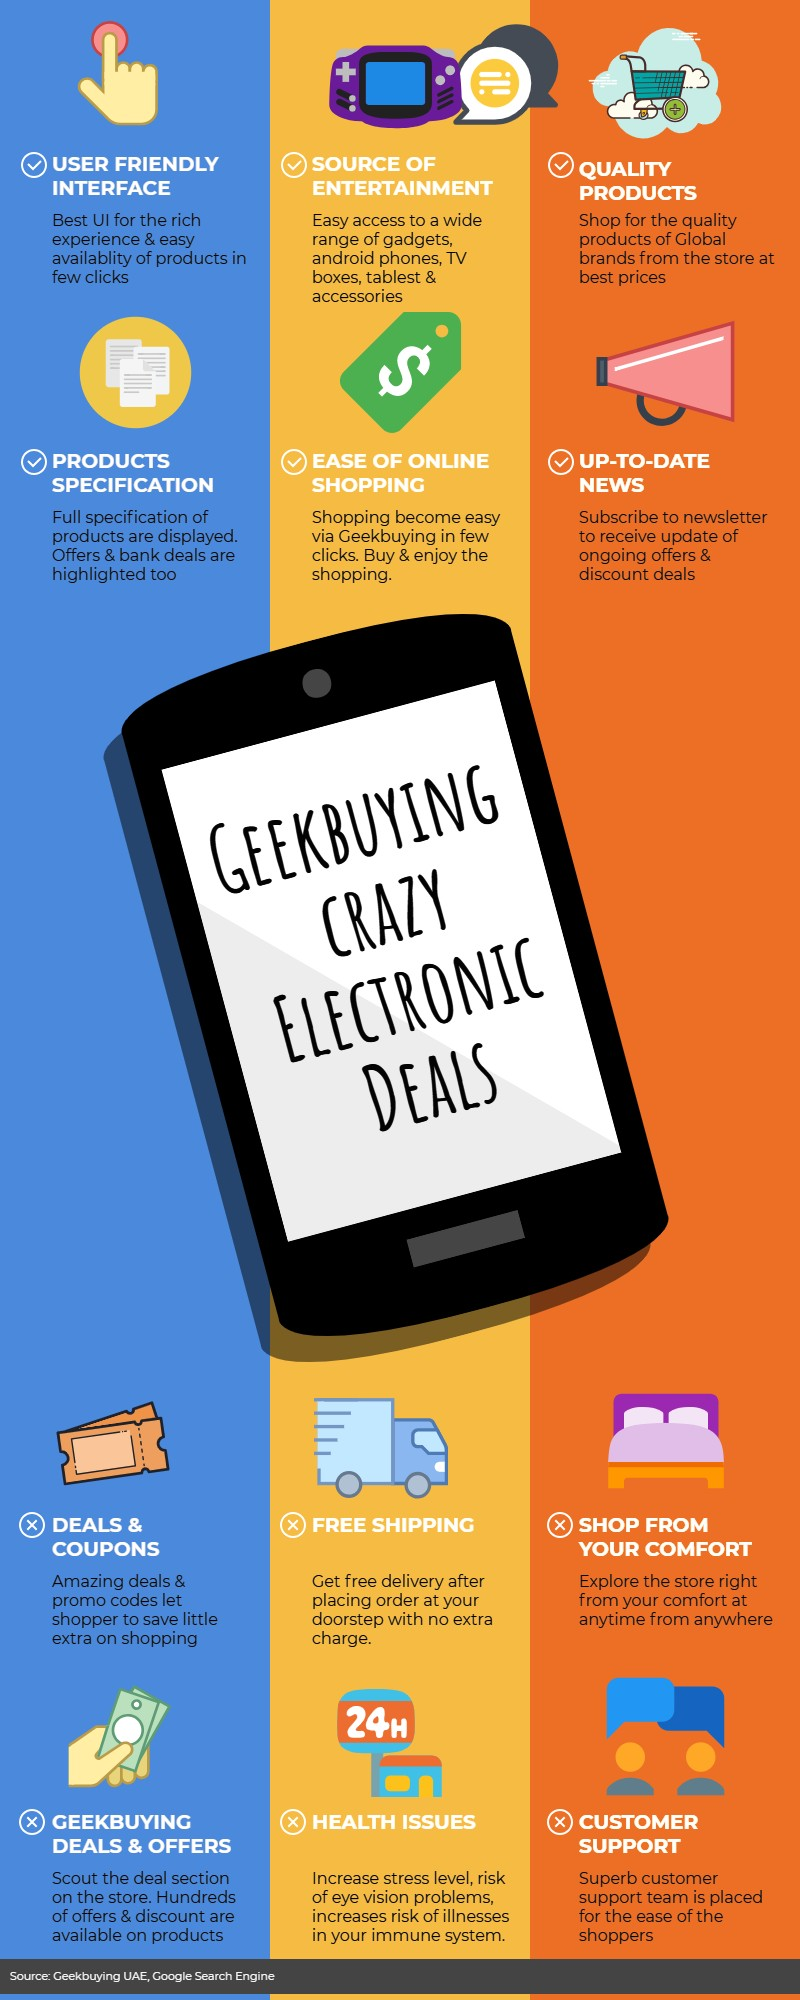 GeekBuying crazy deals on buying Electronics